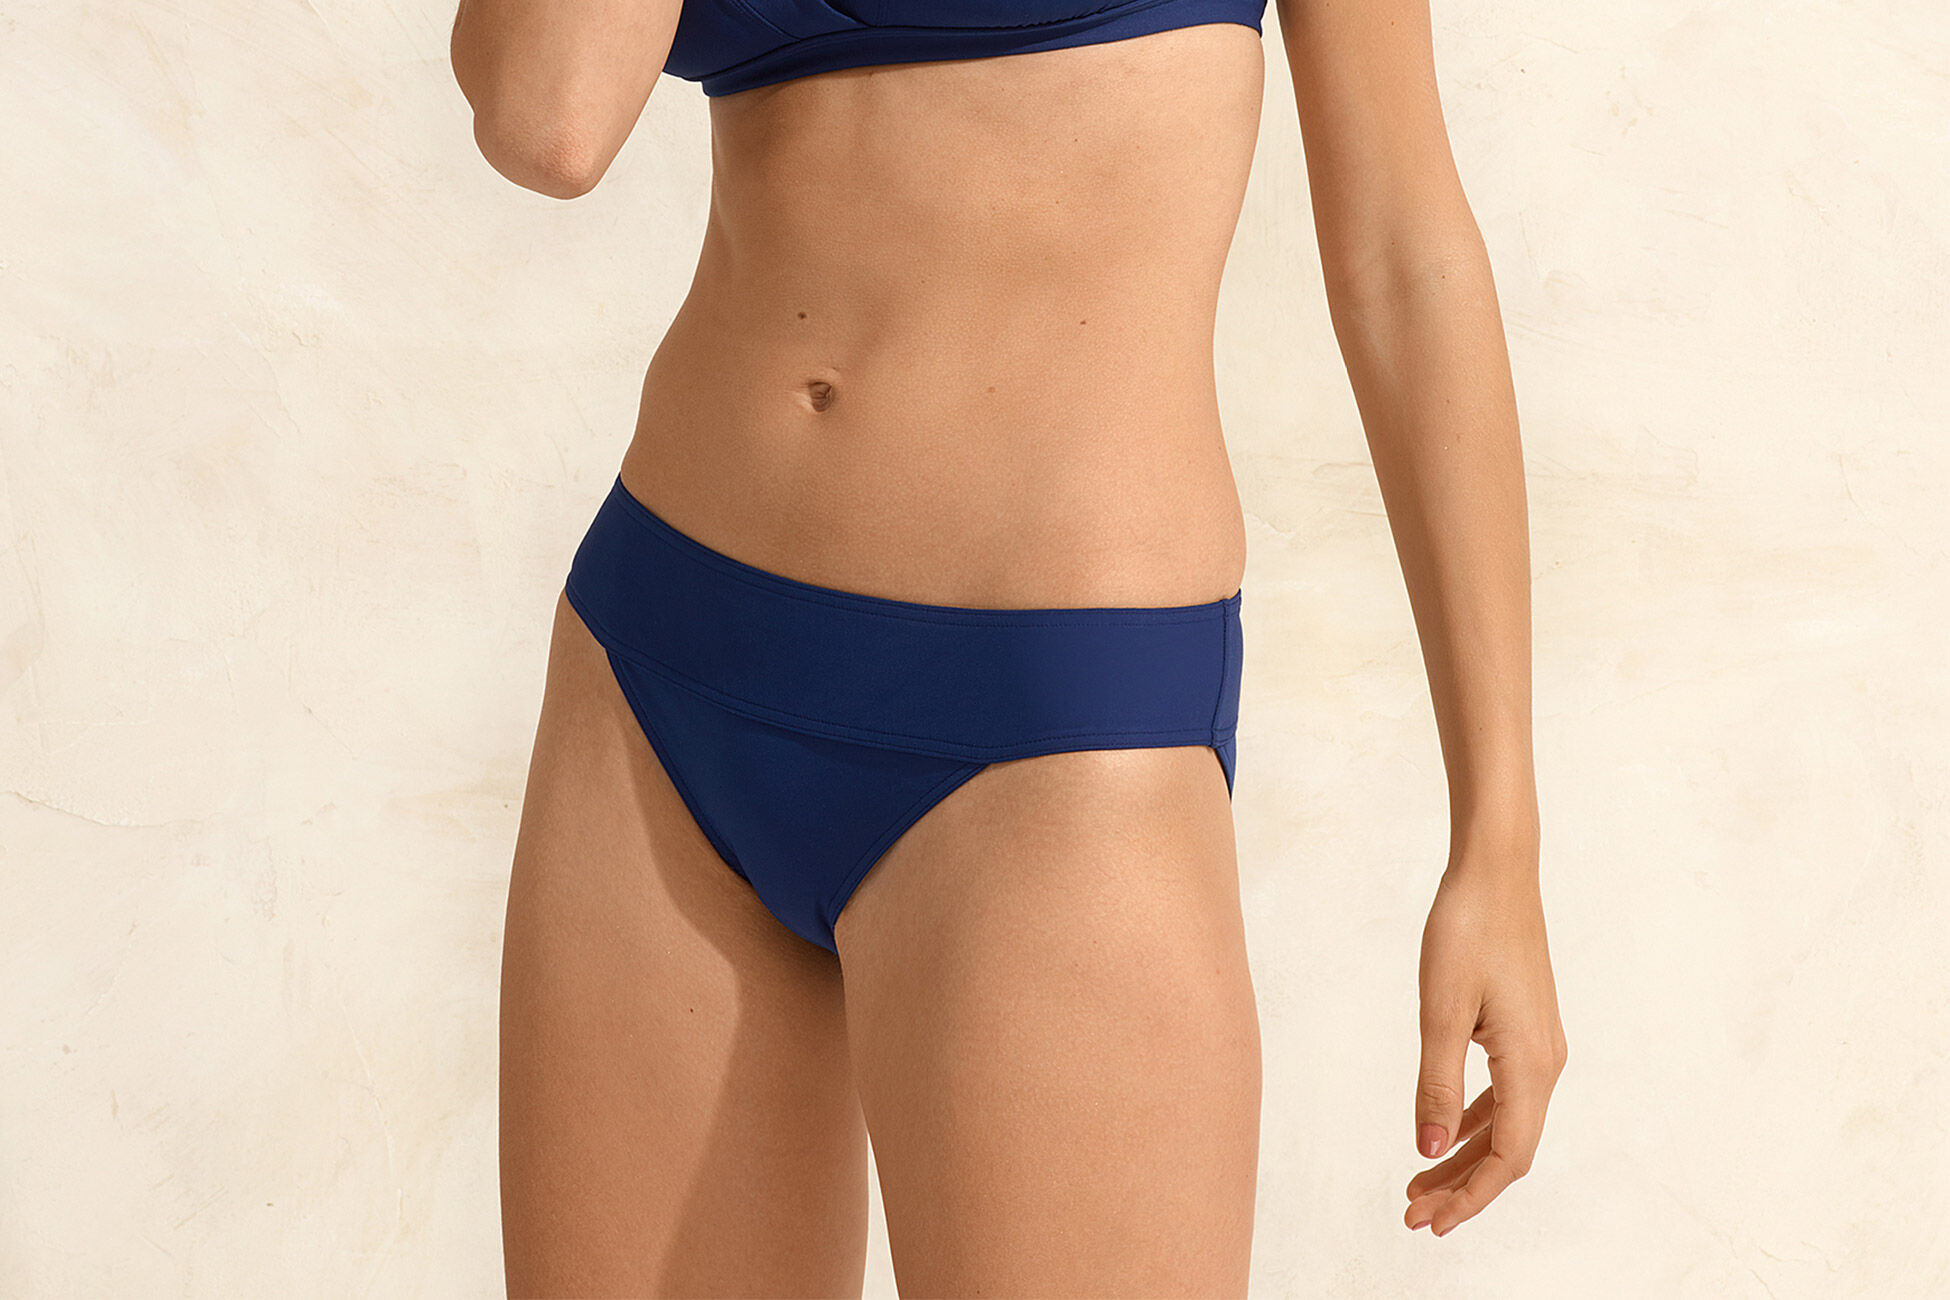 Pactole Classic bikini briefs standard view �